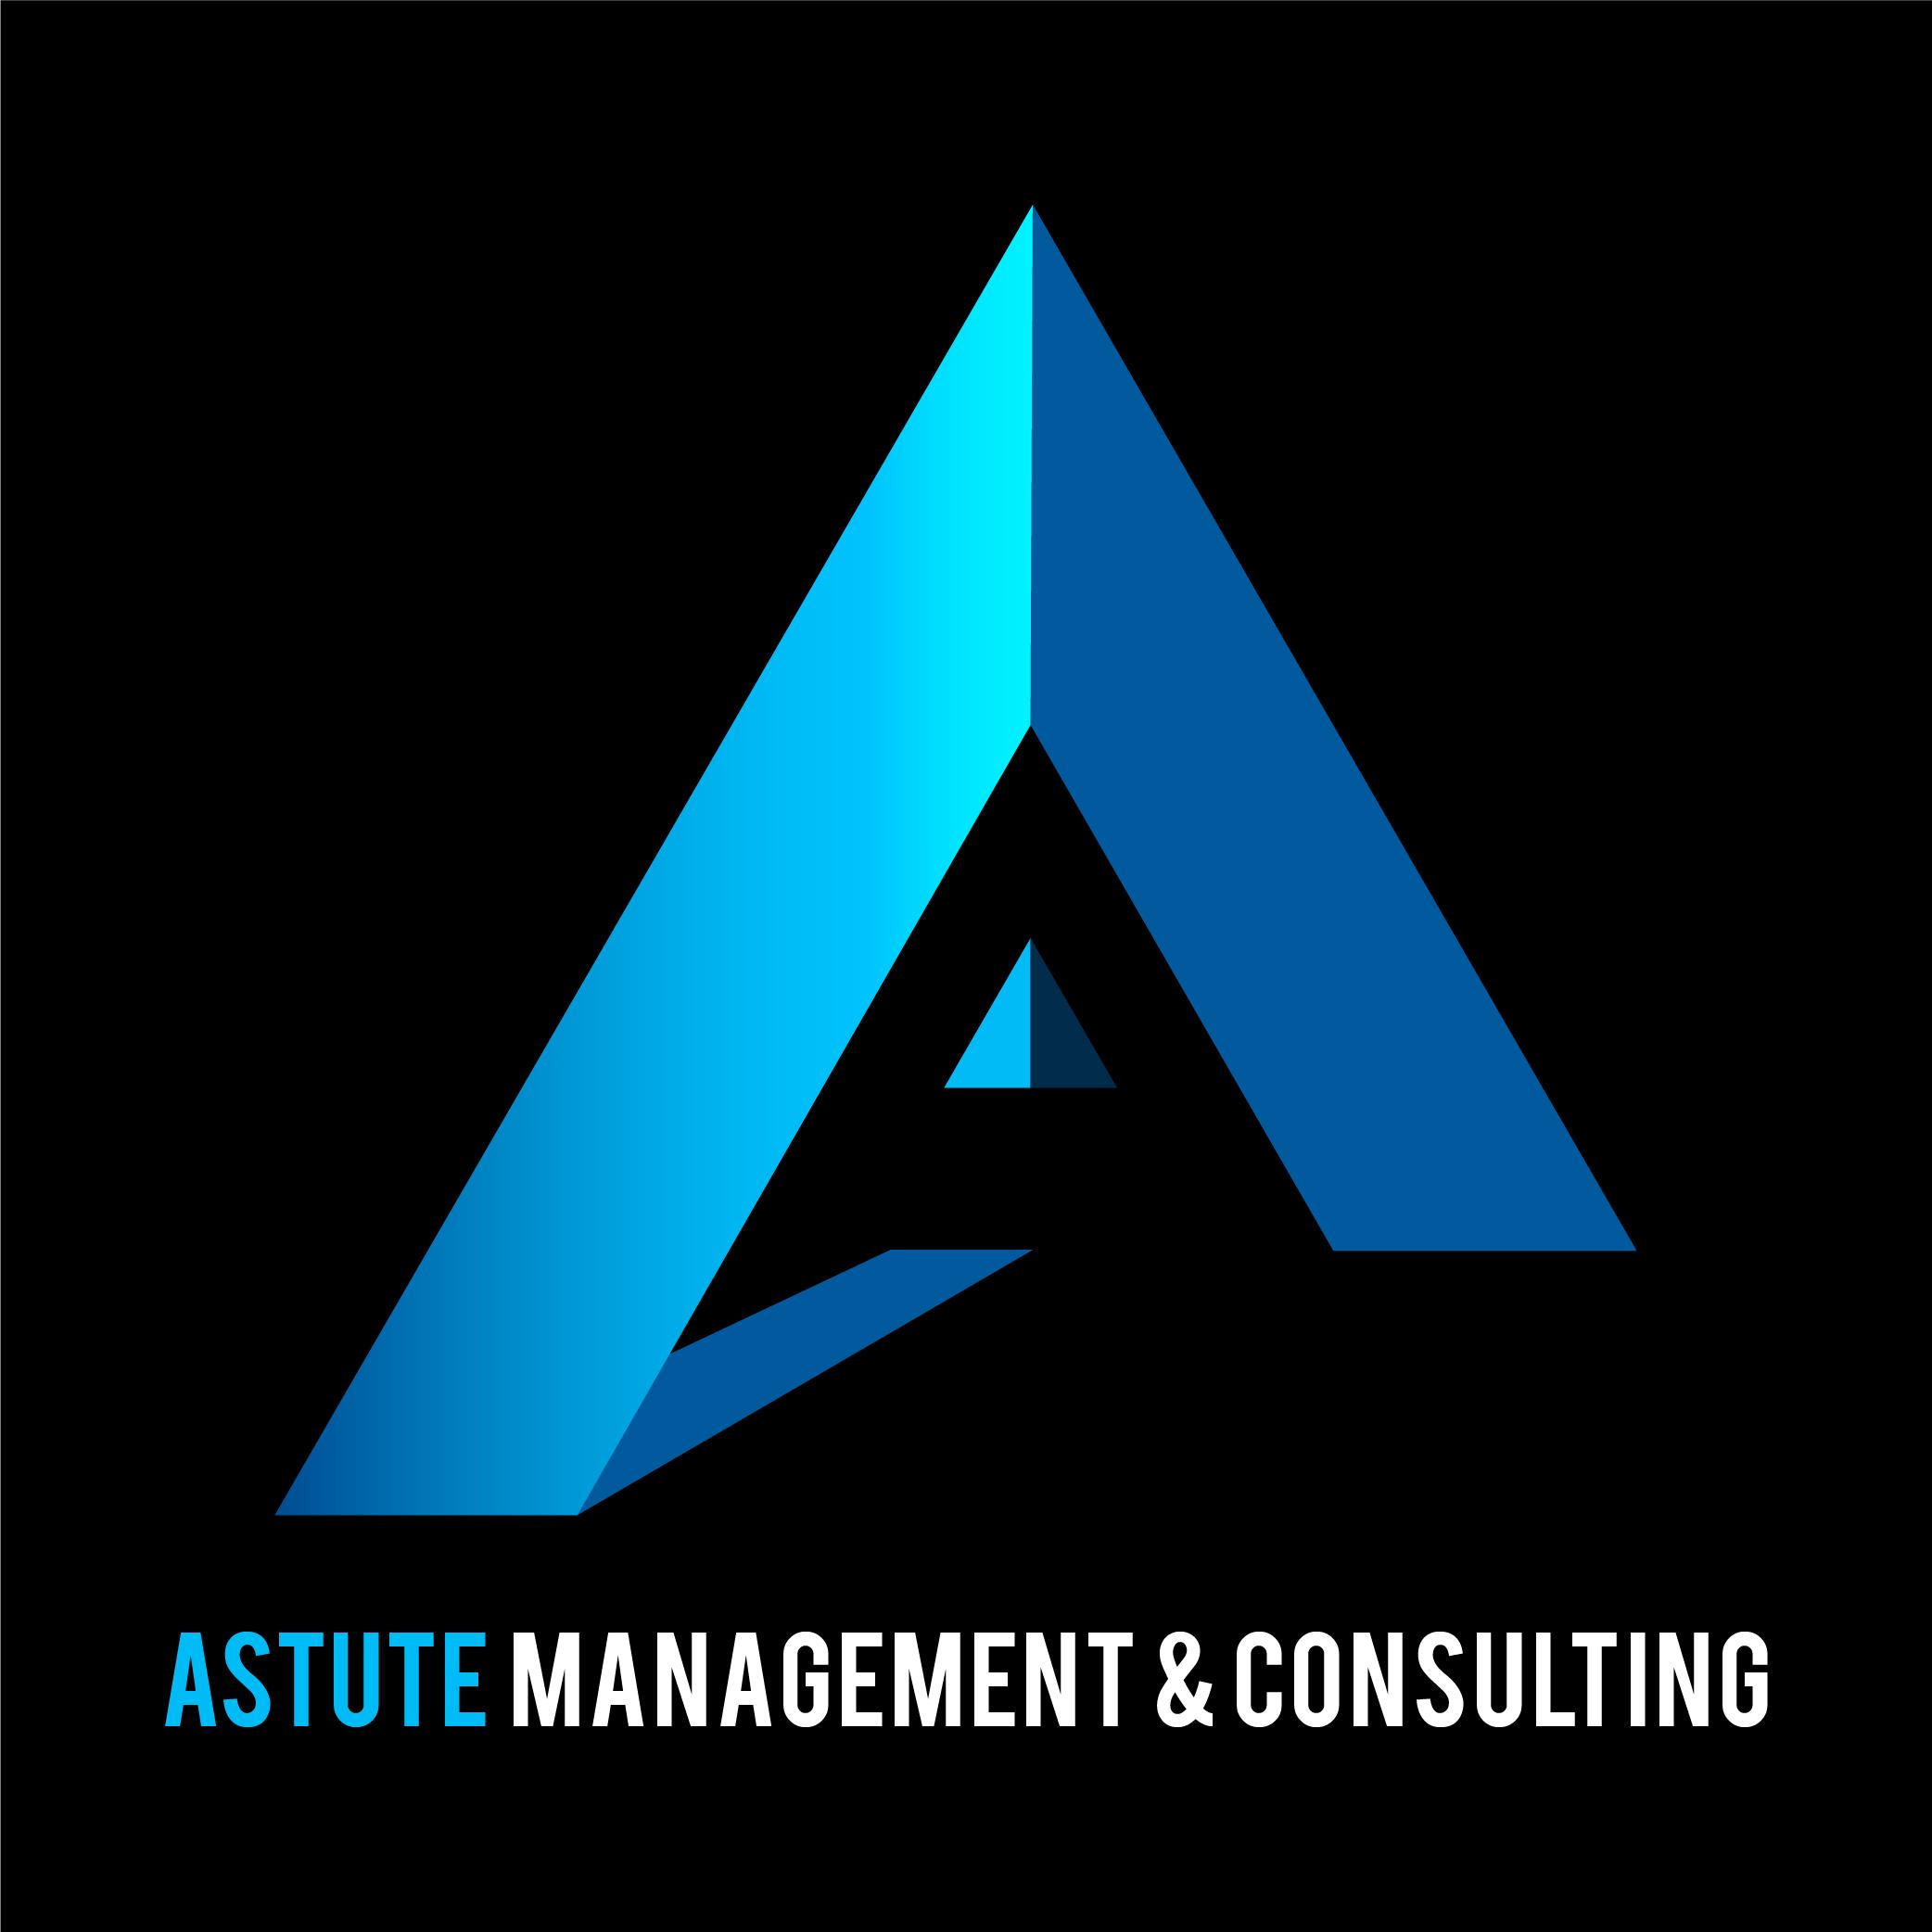 Astute Management & Consulting Logo 2019-01.jpg